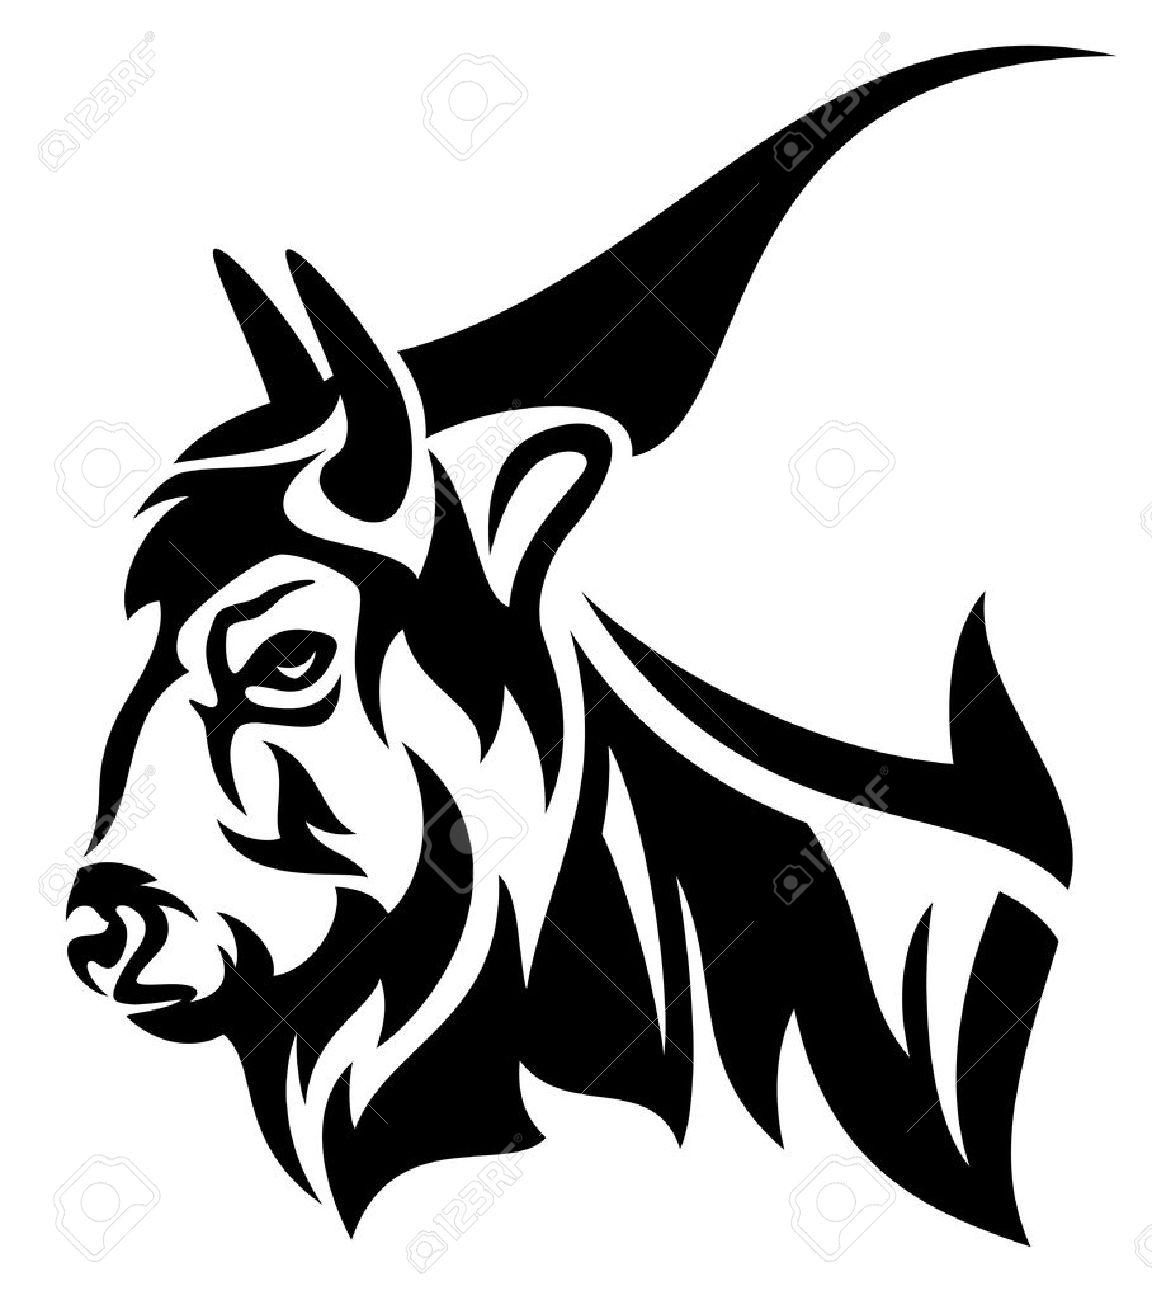 bison profile head design - black and white vector outline - 26362901